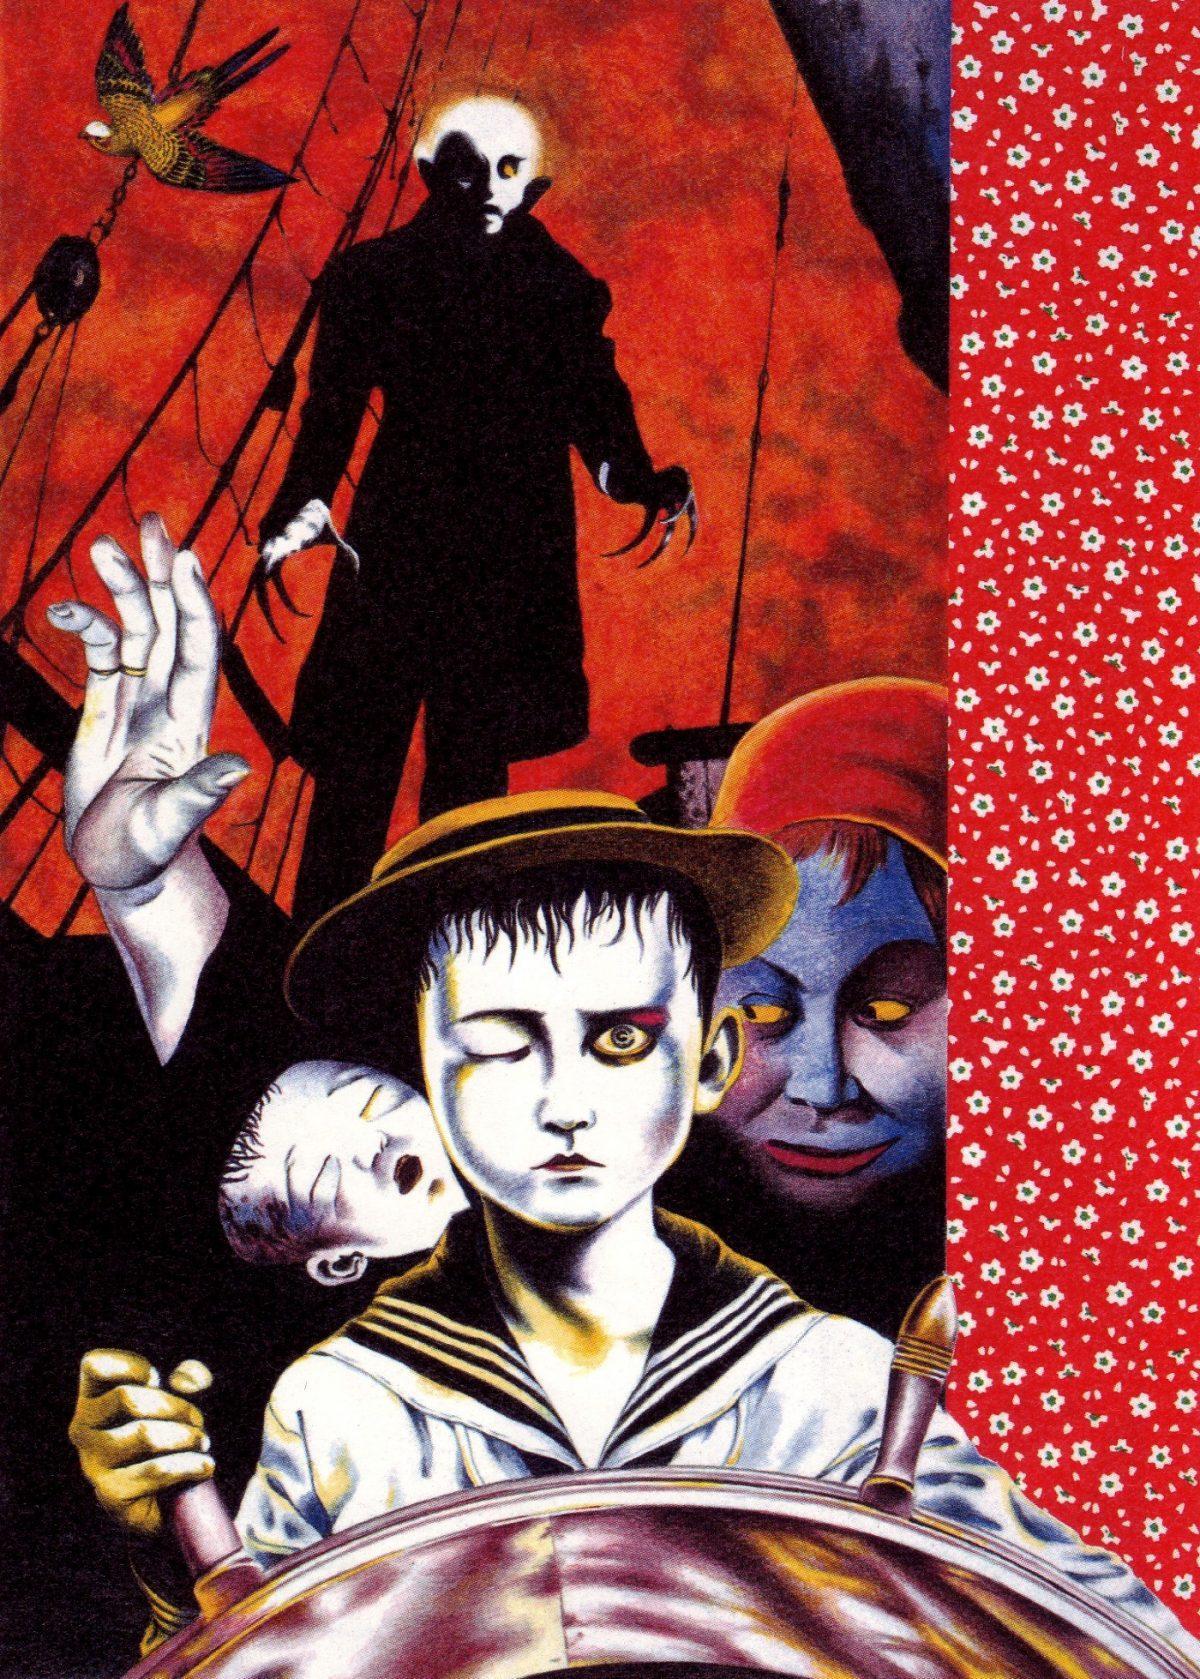 Blink: L'horreur léchant le globe oculaire de Suehiro Maruo et Strange Other Obsessions (NSFW)